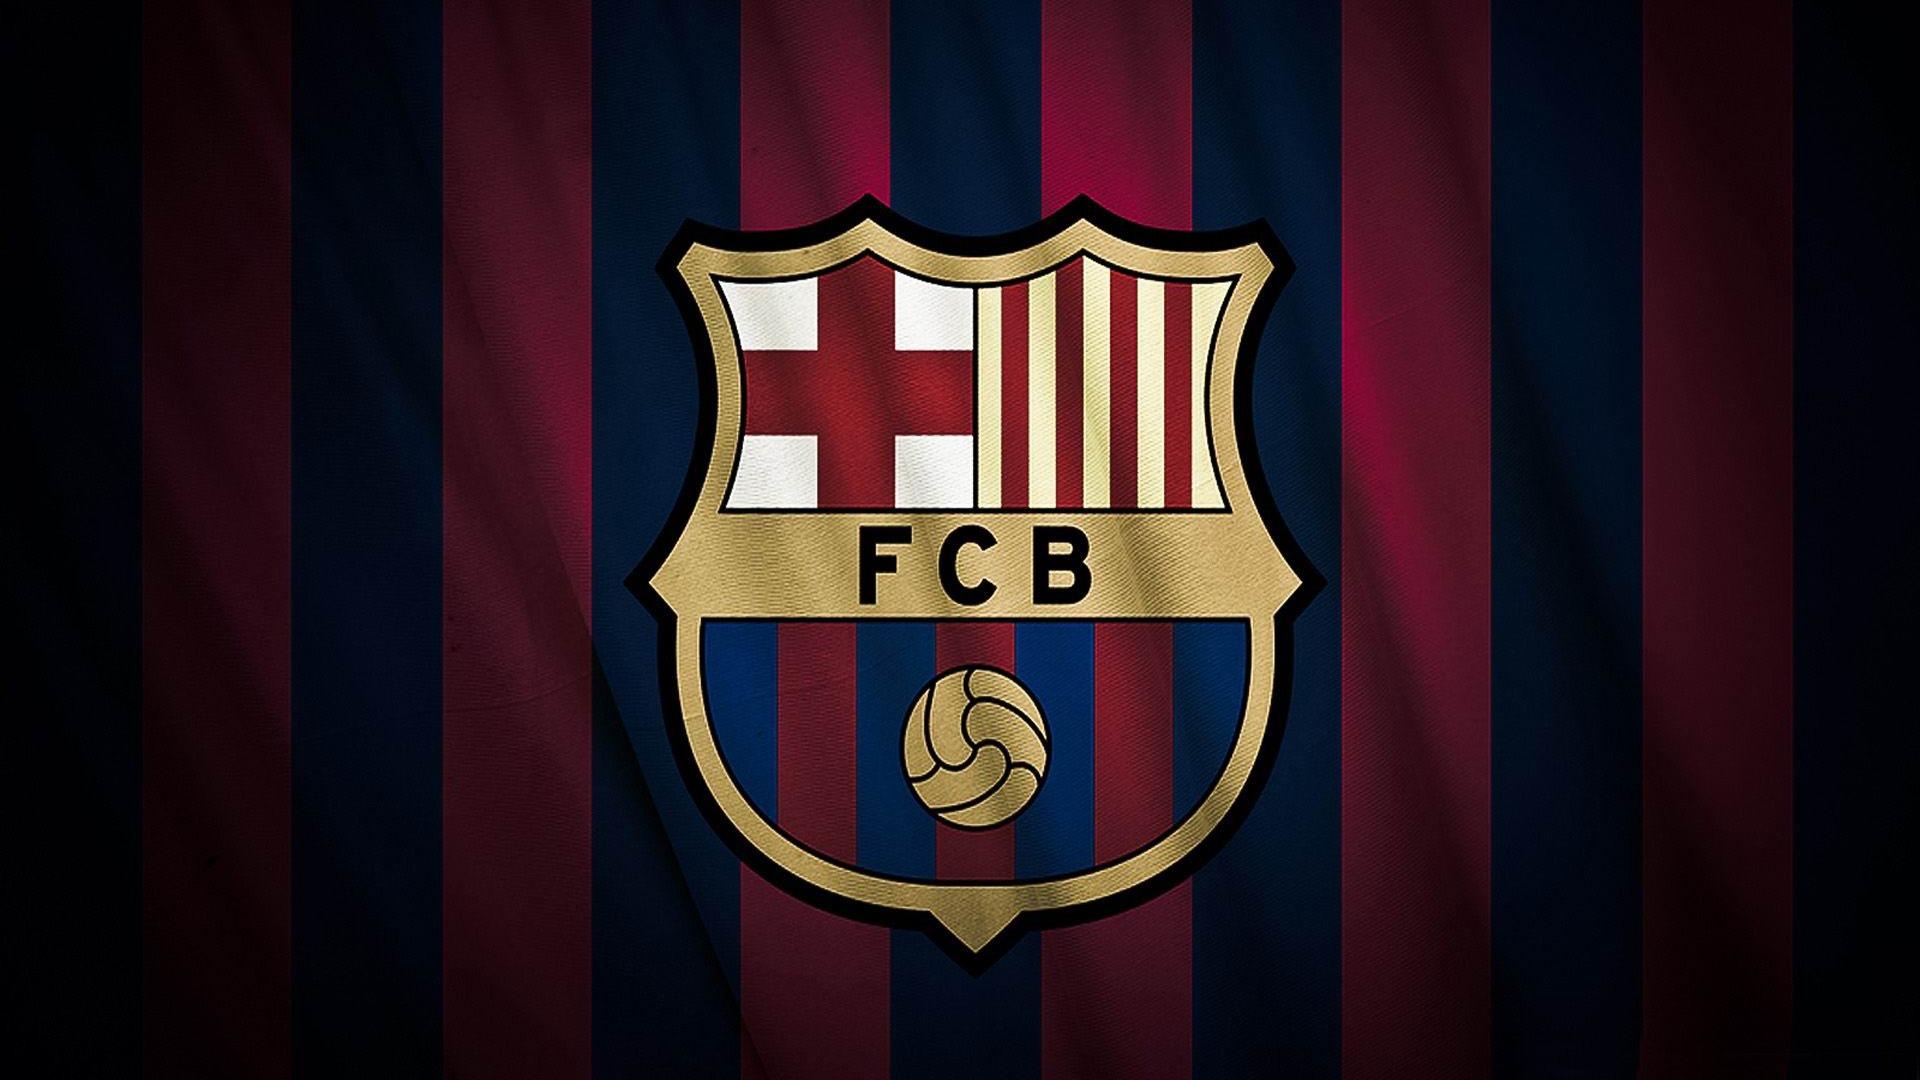 Barcelona Football Logo HD Wallpaper of Football   hdwallpaper2013com 1920x1080